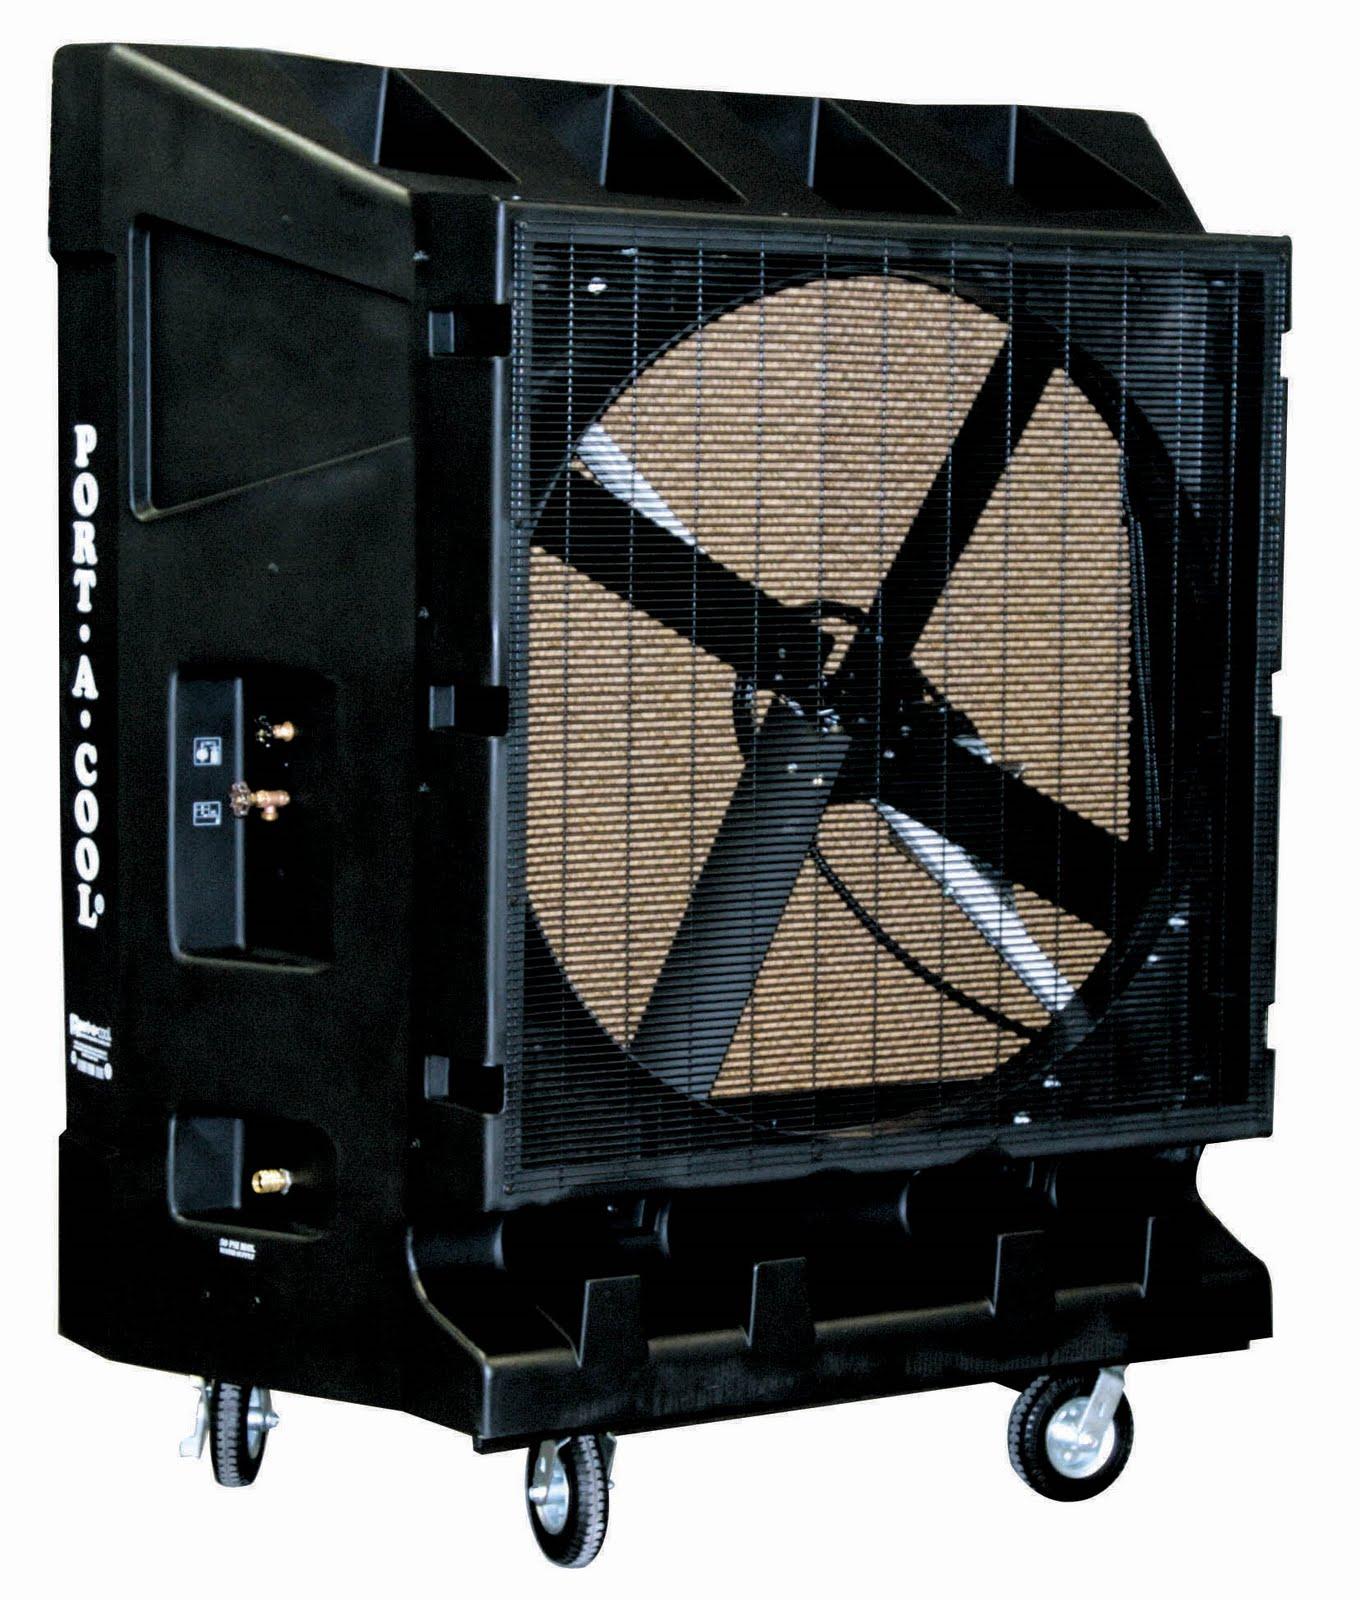 Industrial Swamp Cooler : Port a cool quot evaporative cooler cost saving industrial